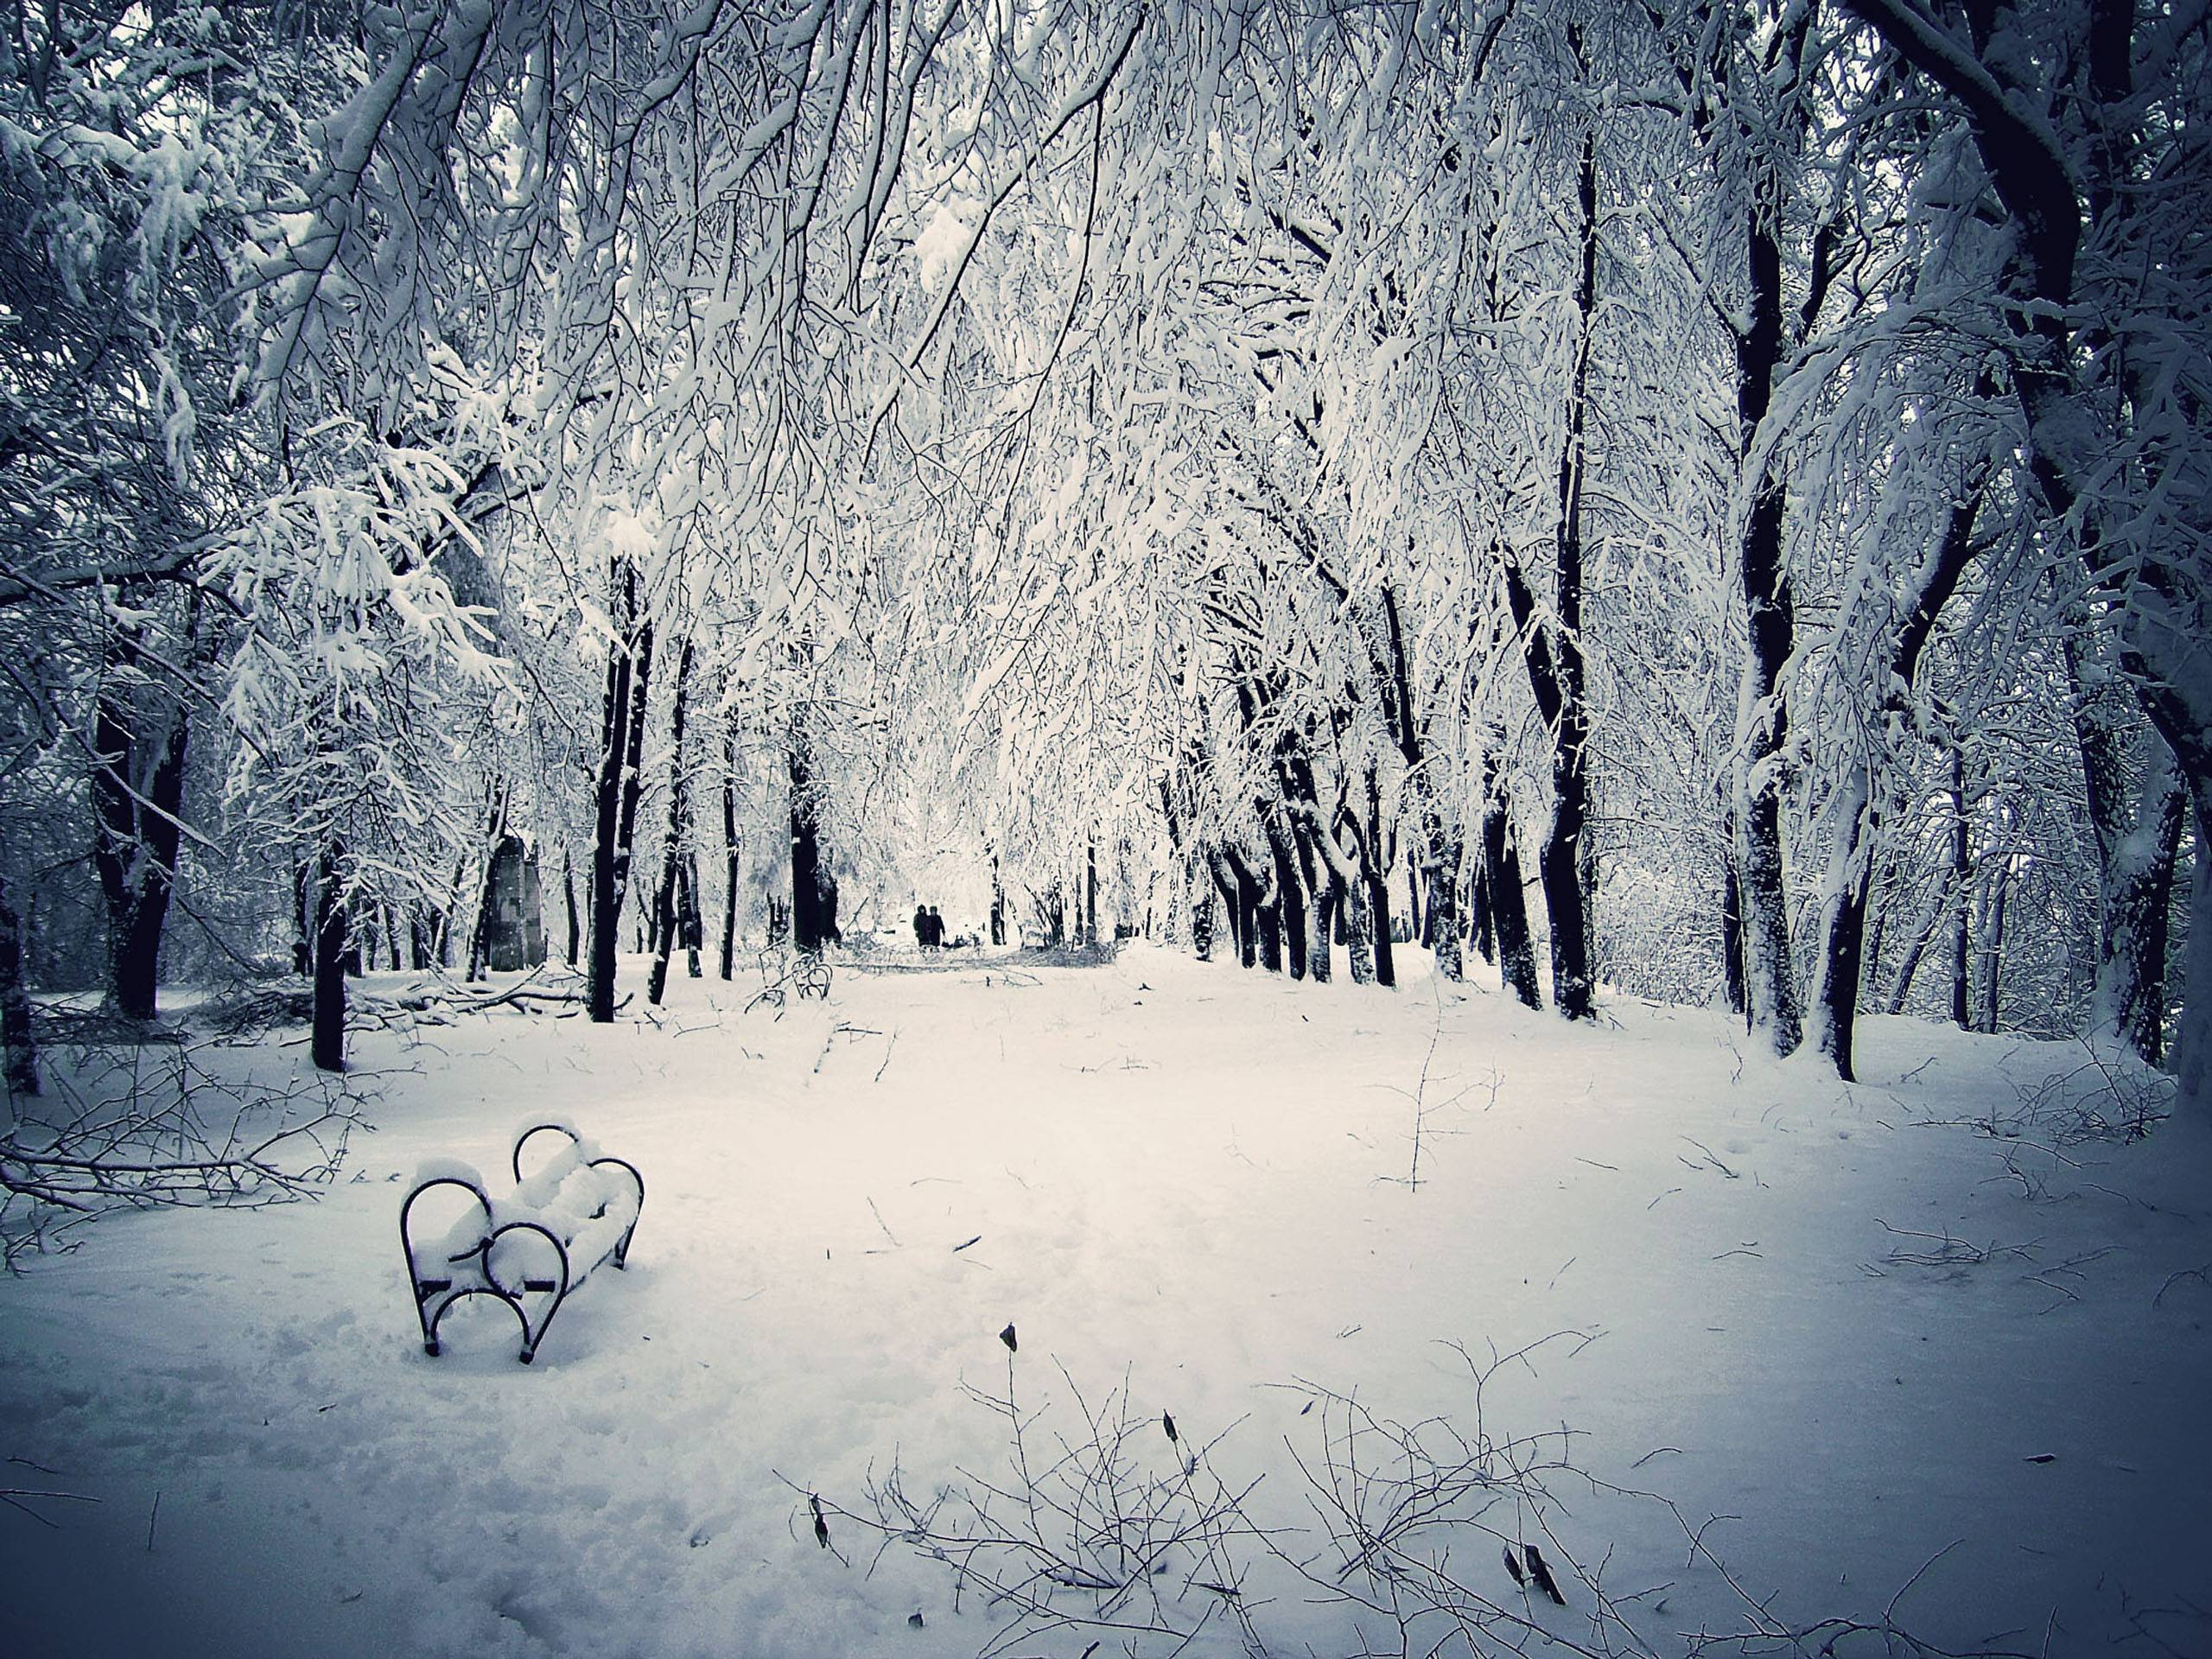 Snowy Scenes Wallpapers